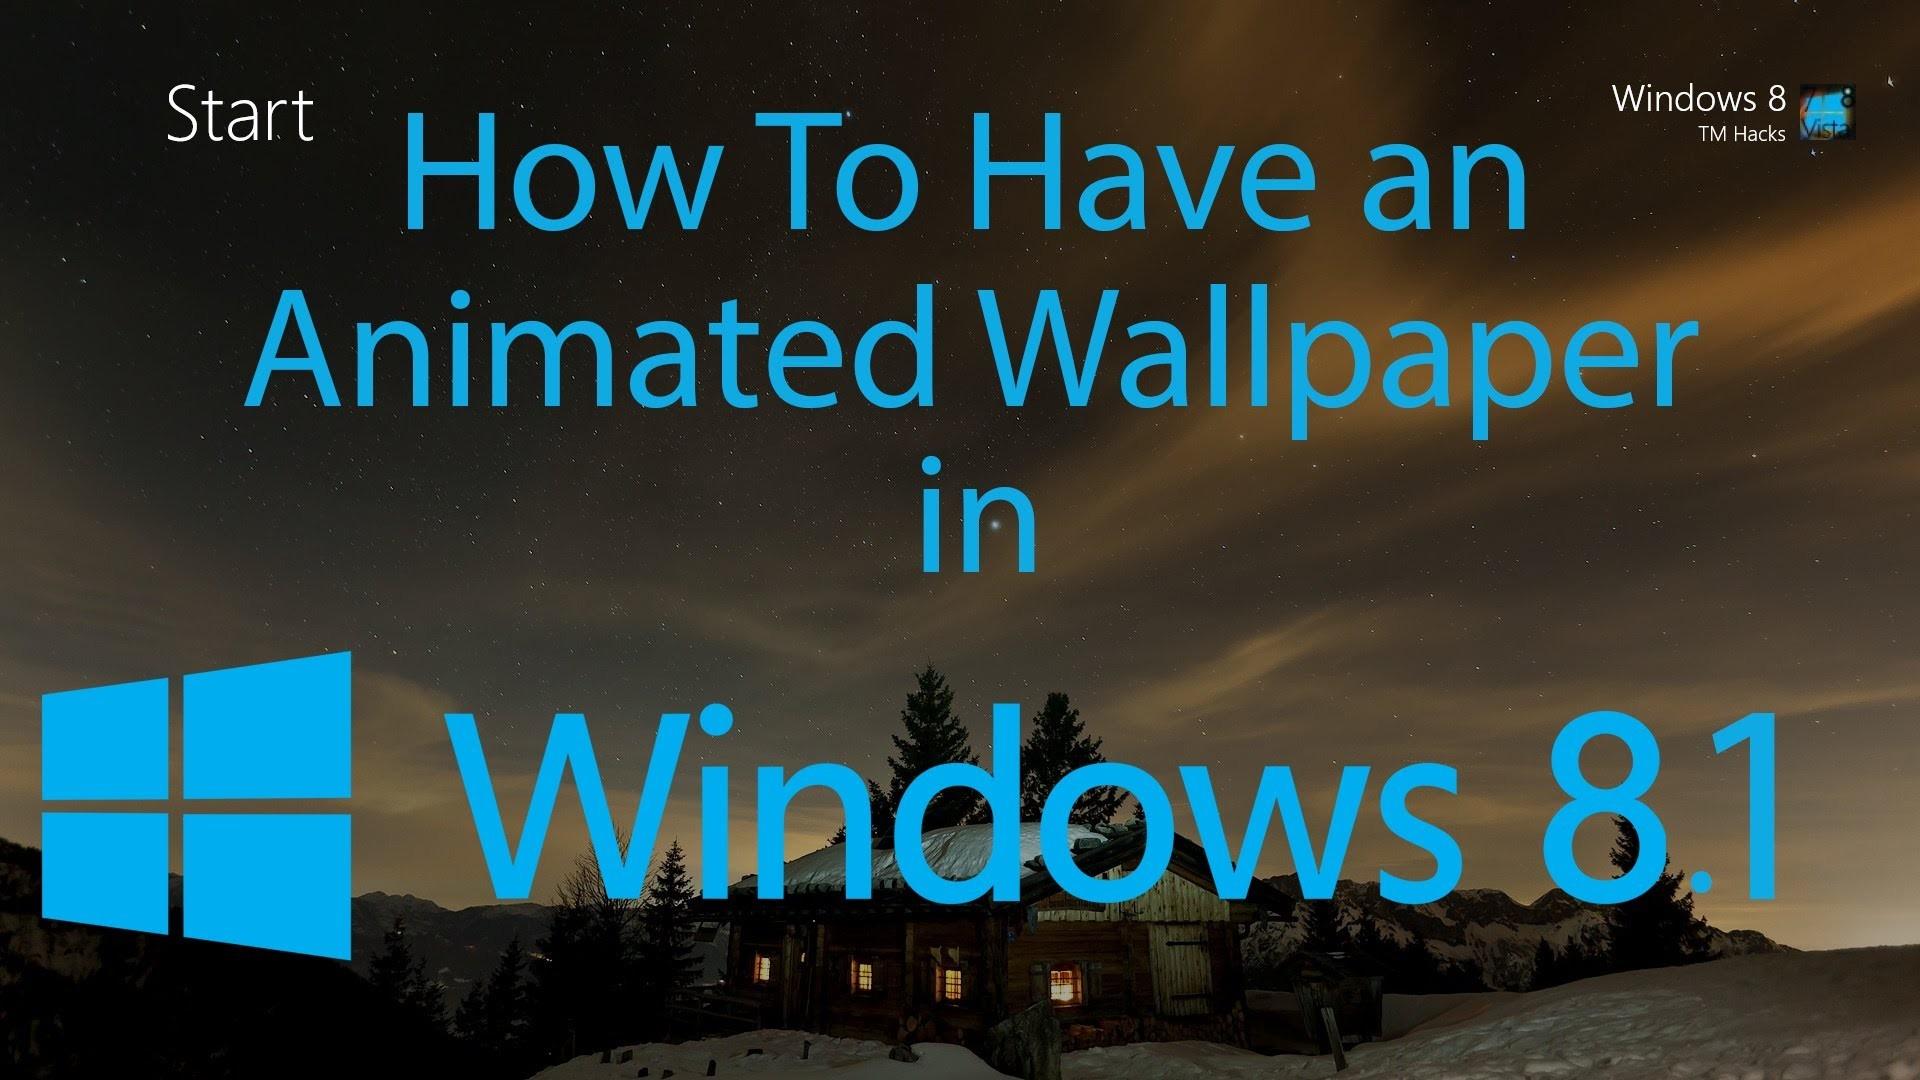 1920x1080 Windows-8-Live-Wallpapers-HD-Wallpaper.jpg